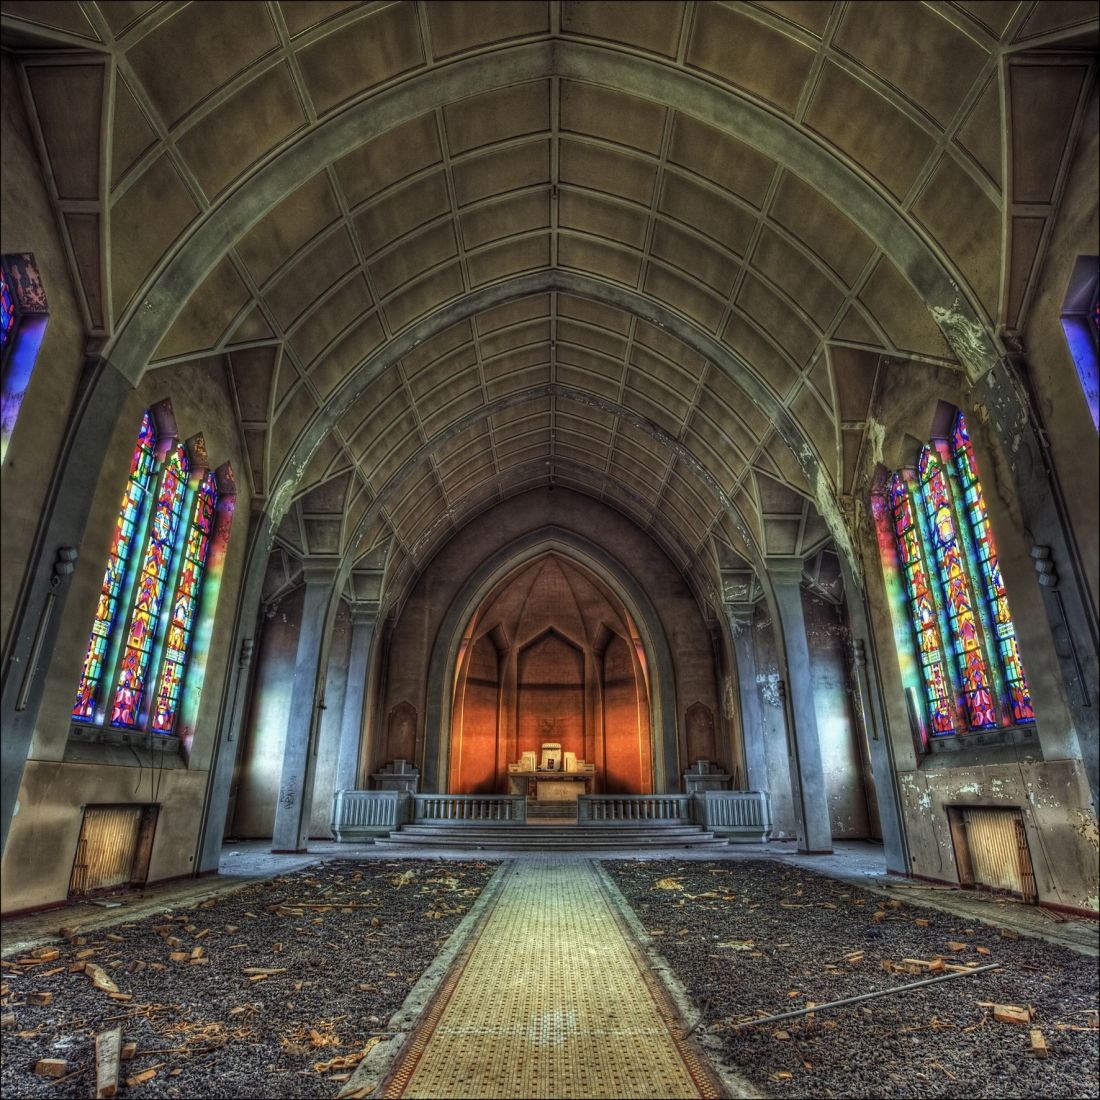 Kerk urback 100x100 plexiglas